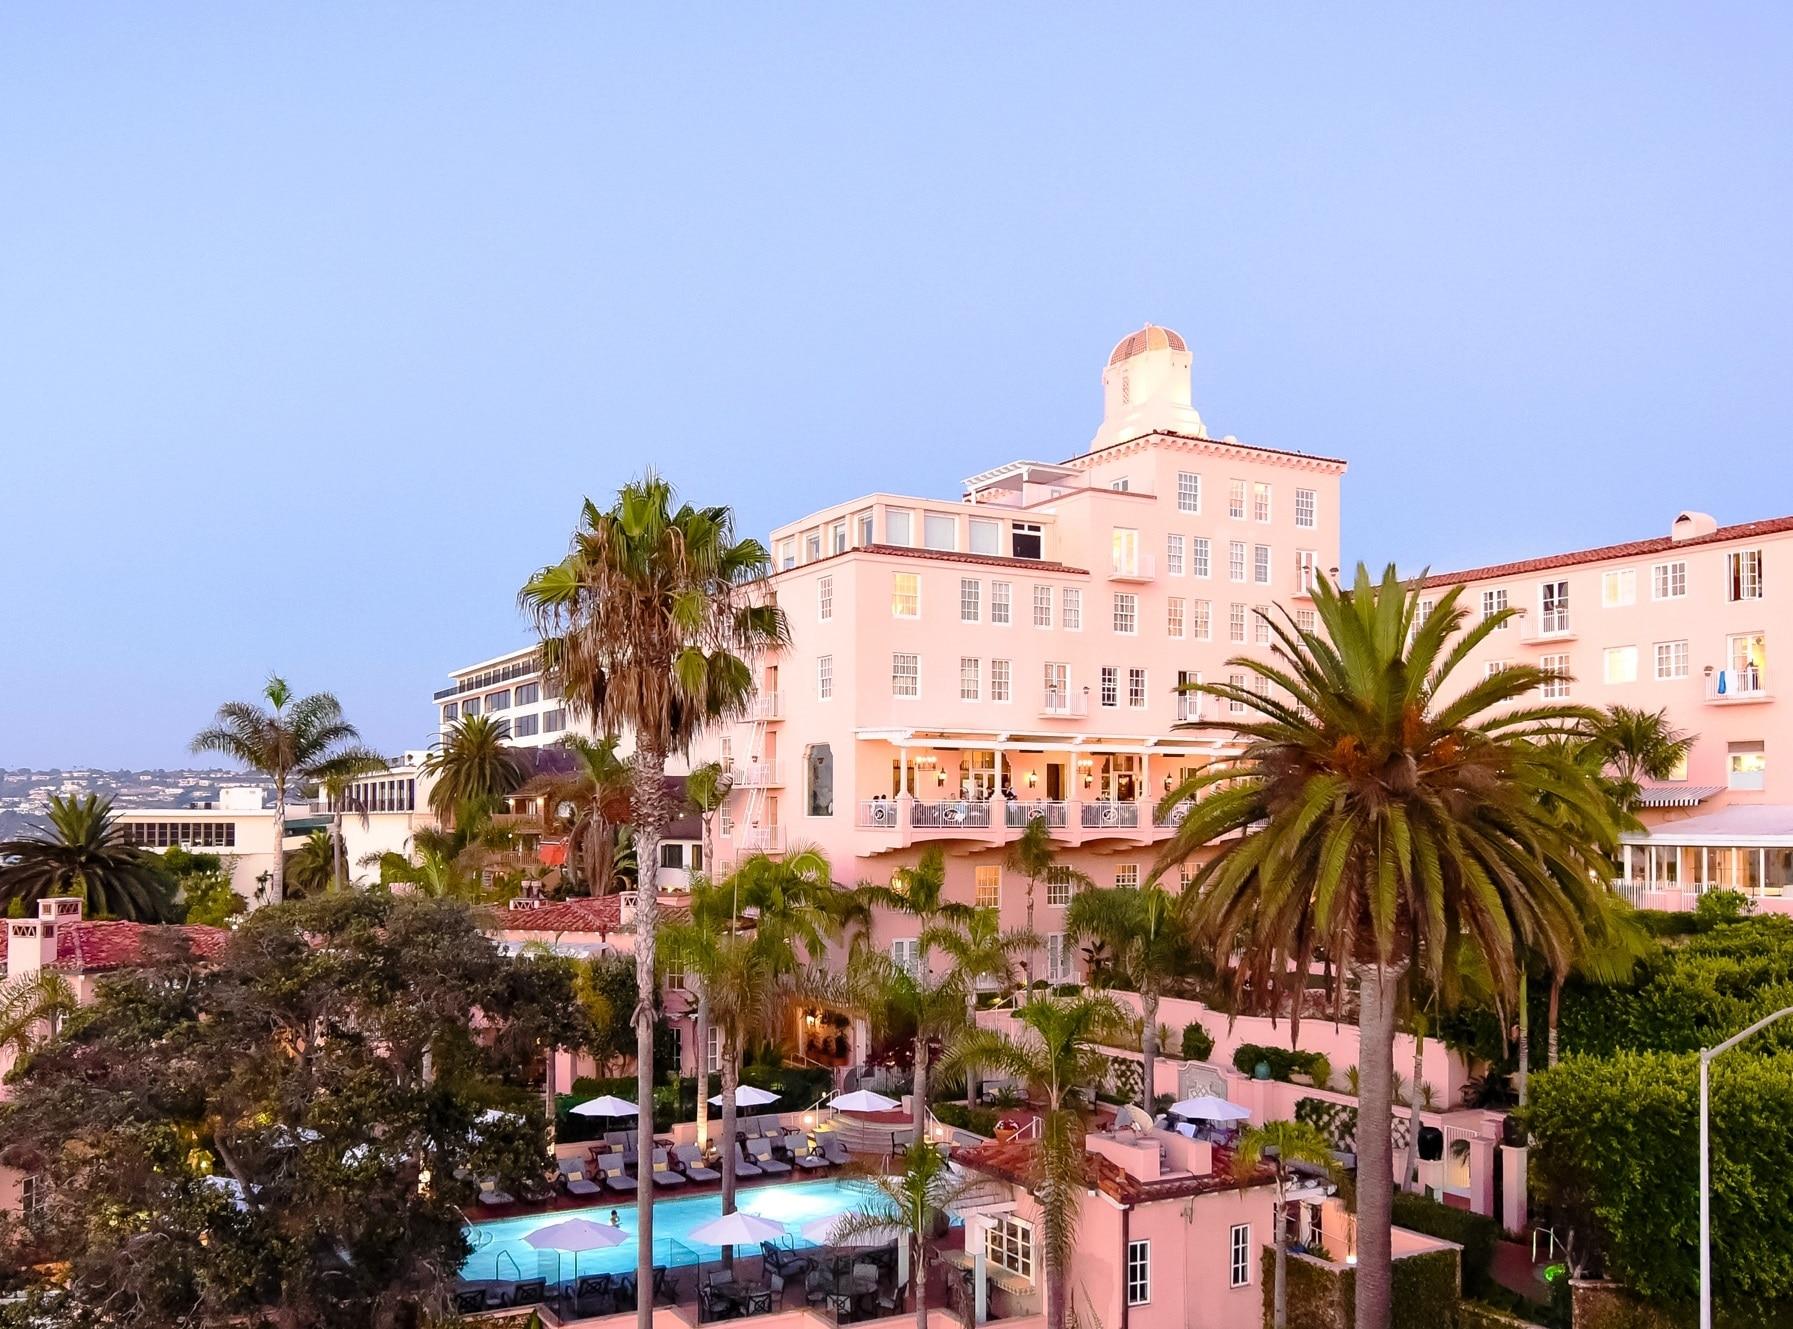 La Valencia Hotel is located on La Jolla's Prospect Street